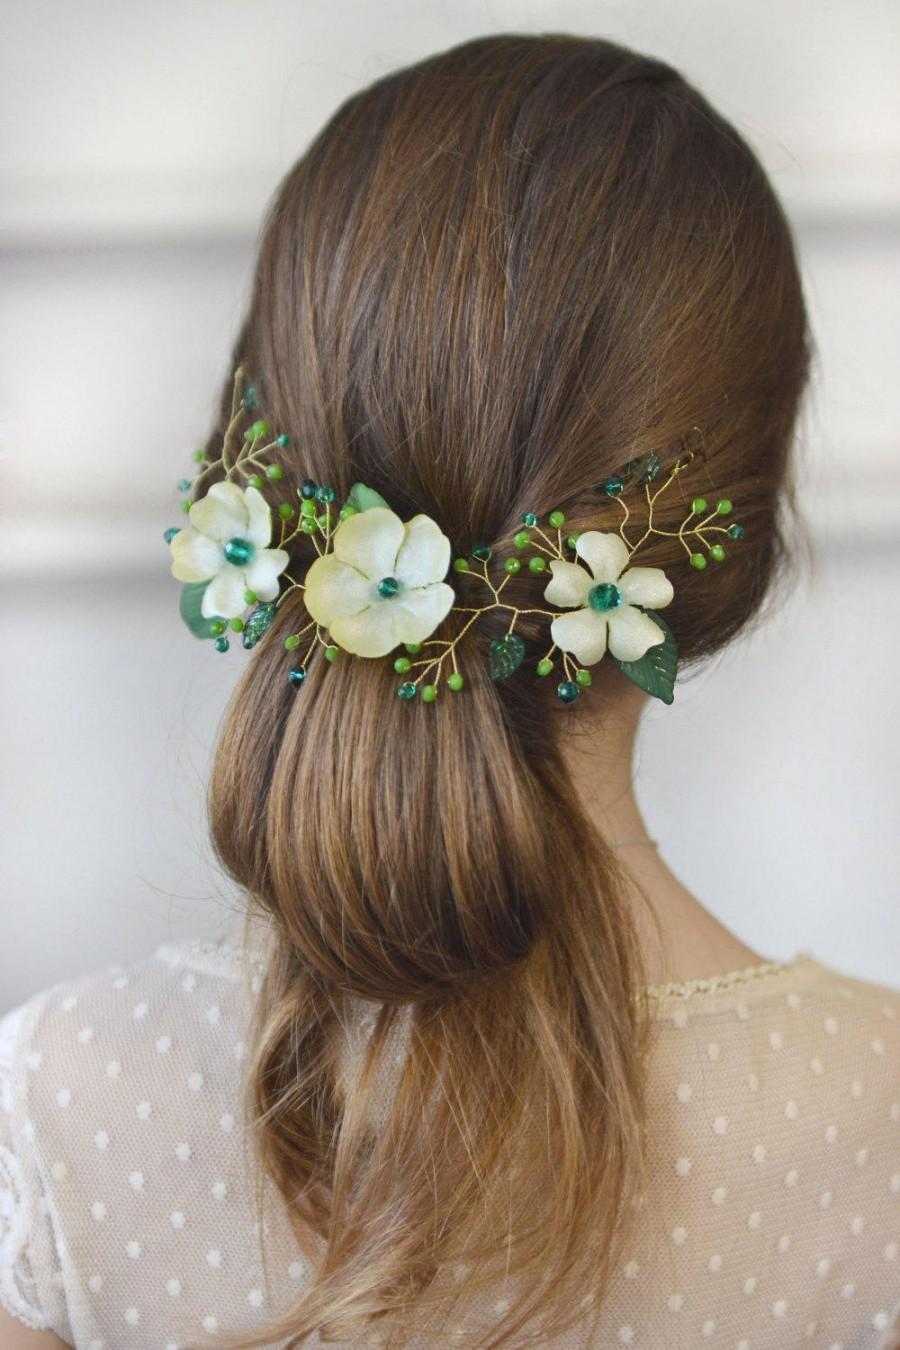 Wedding - Green hair vine Emerald crystal hair back head piece Floral green vine leaves head wreath Emerald wedding piece back crown - $35.00 USD